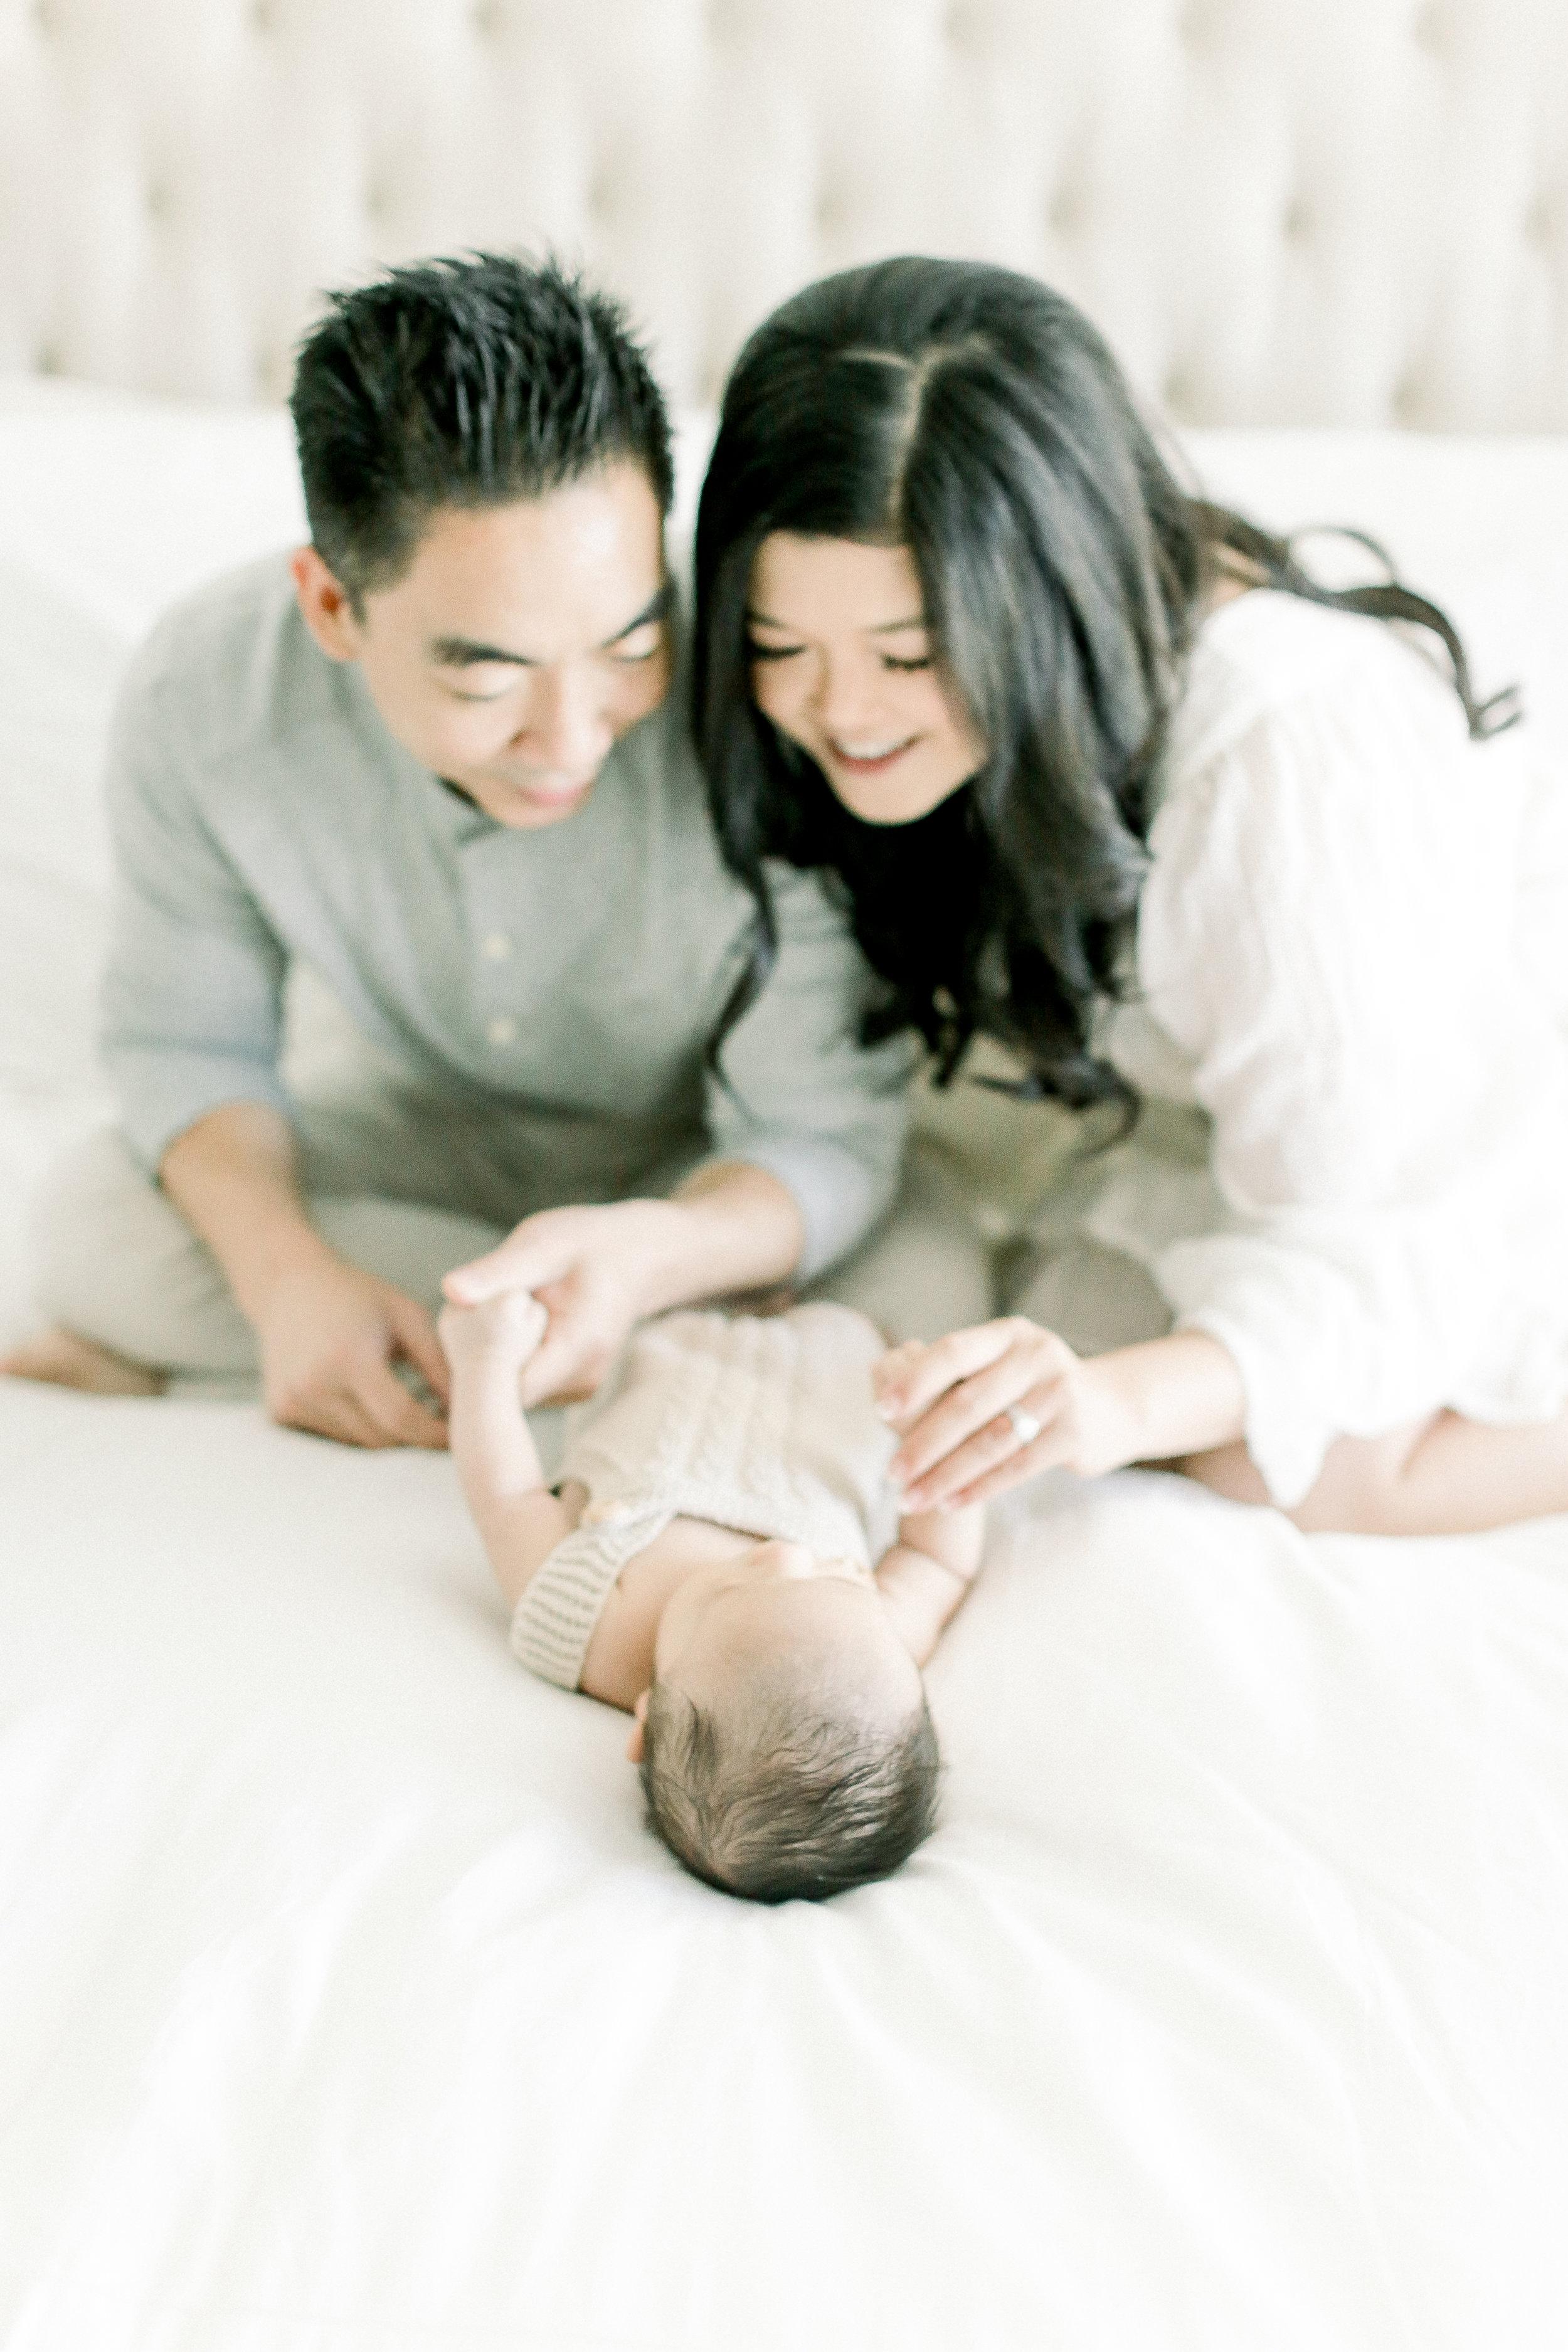 Cori-Kleckner-Photography- Liao Family Session1-9.JPG